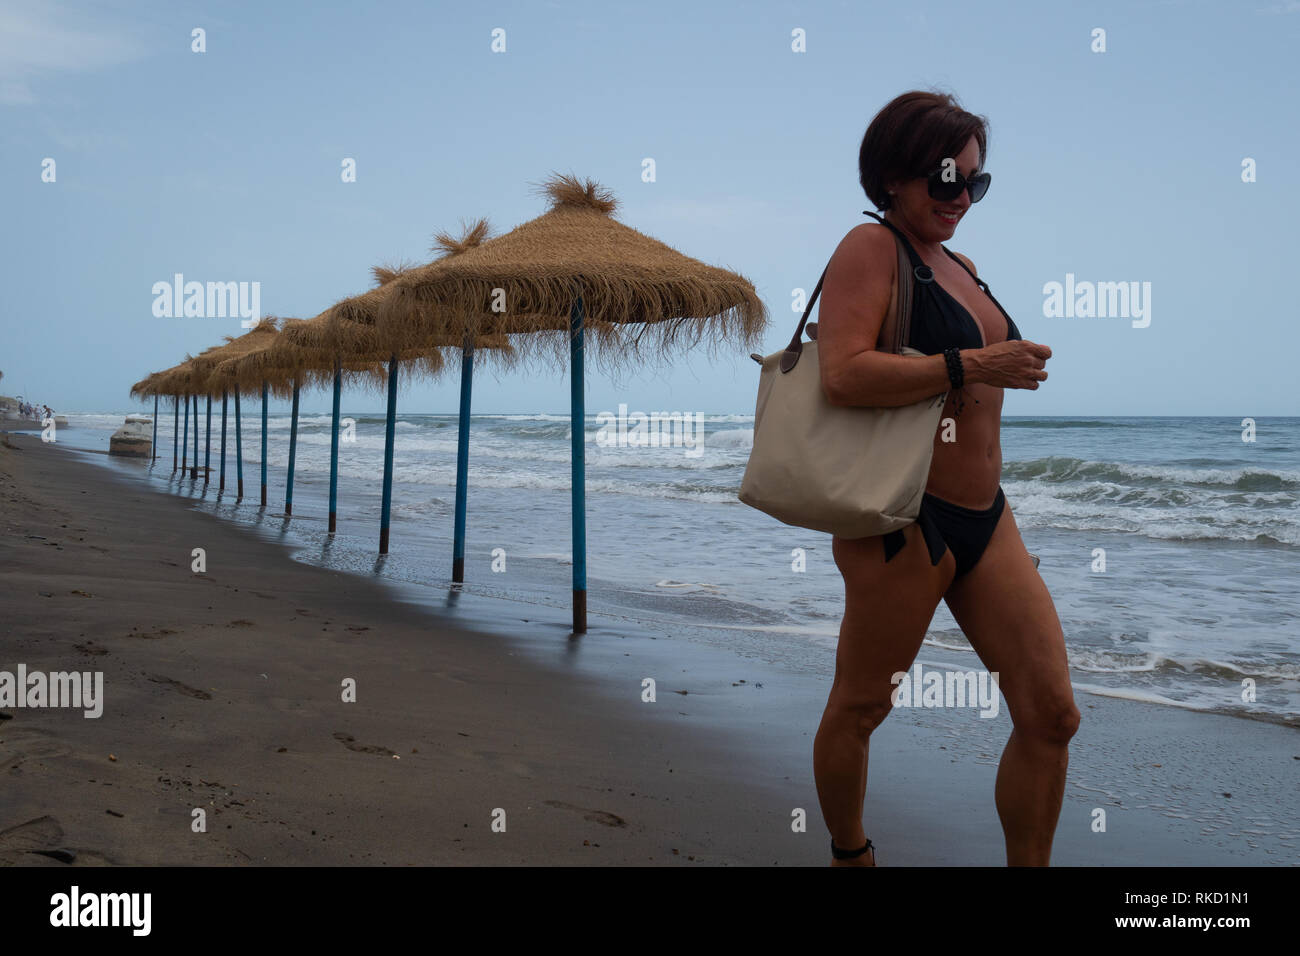 Woman in bikini walking past beach umbrellas as the tide water is coming in - Stock Image